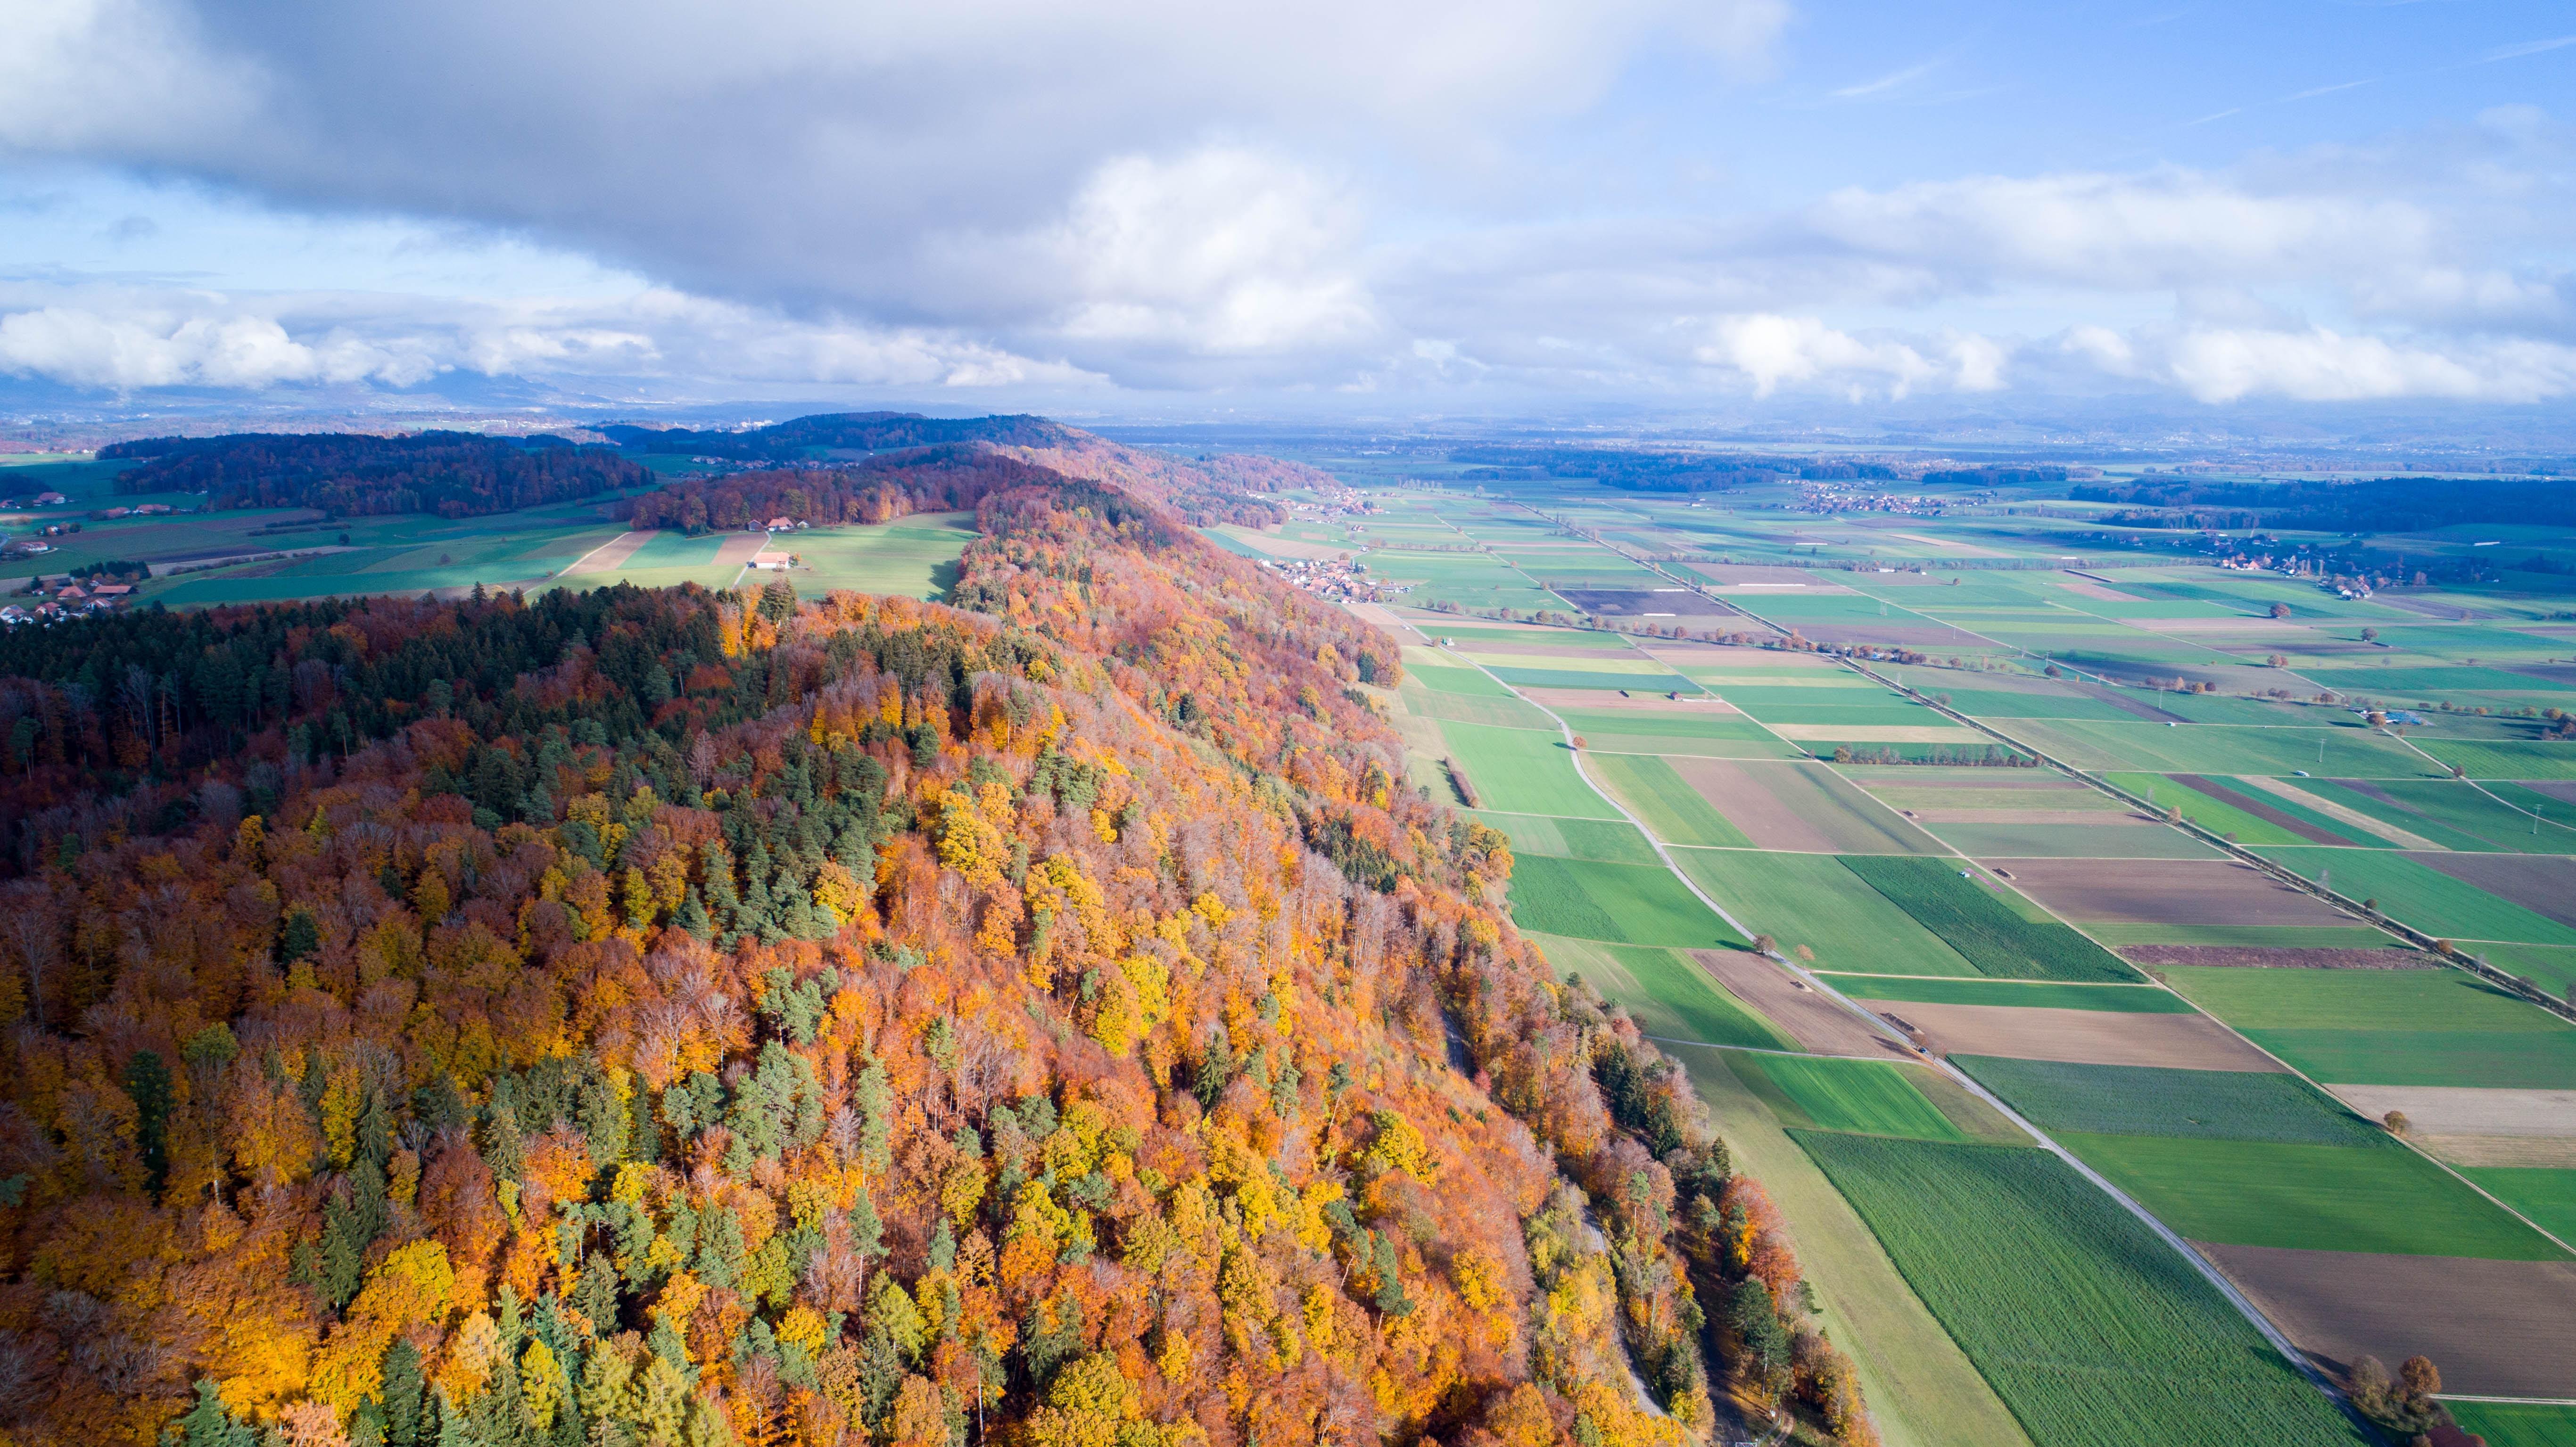 high-angle photography of tree and mountain